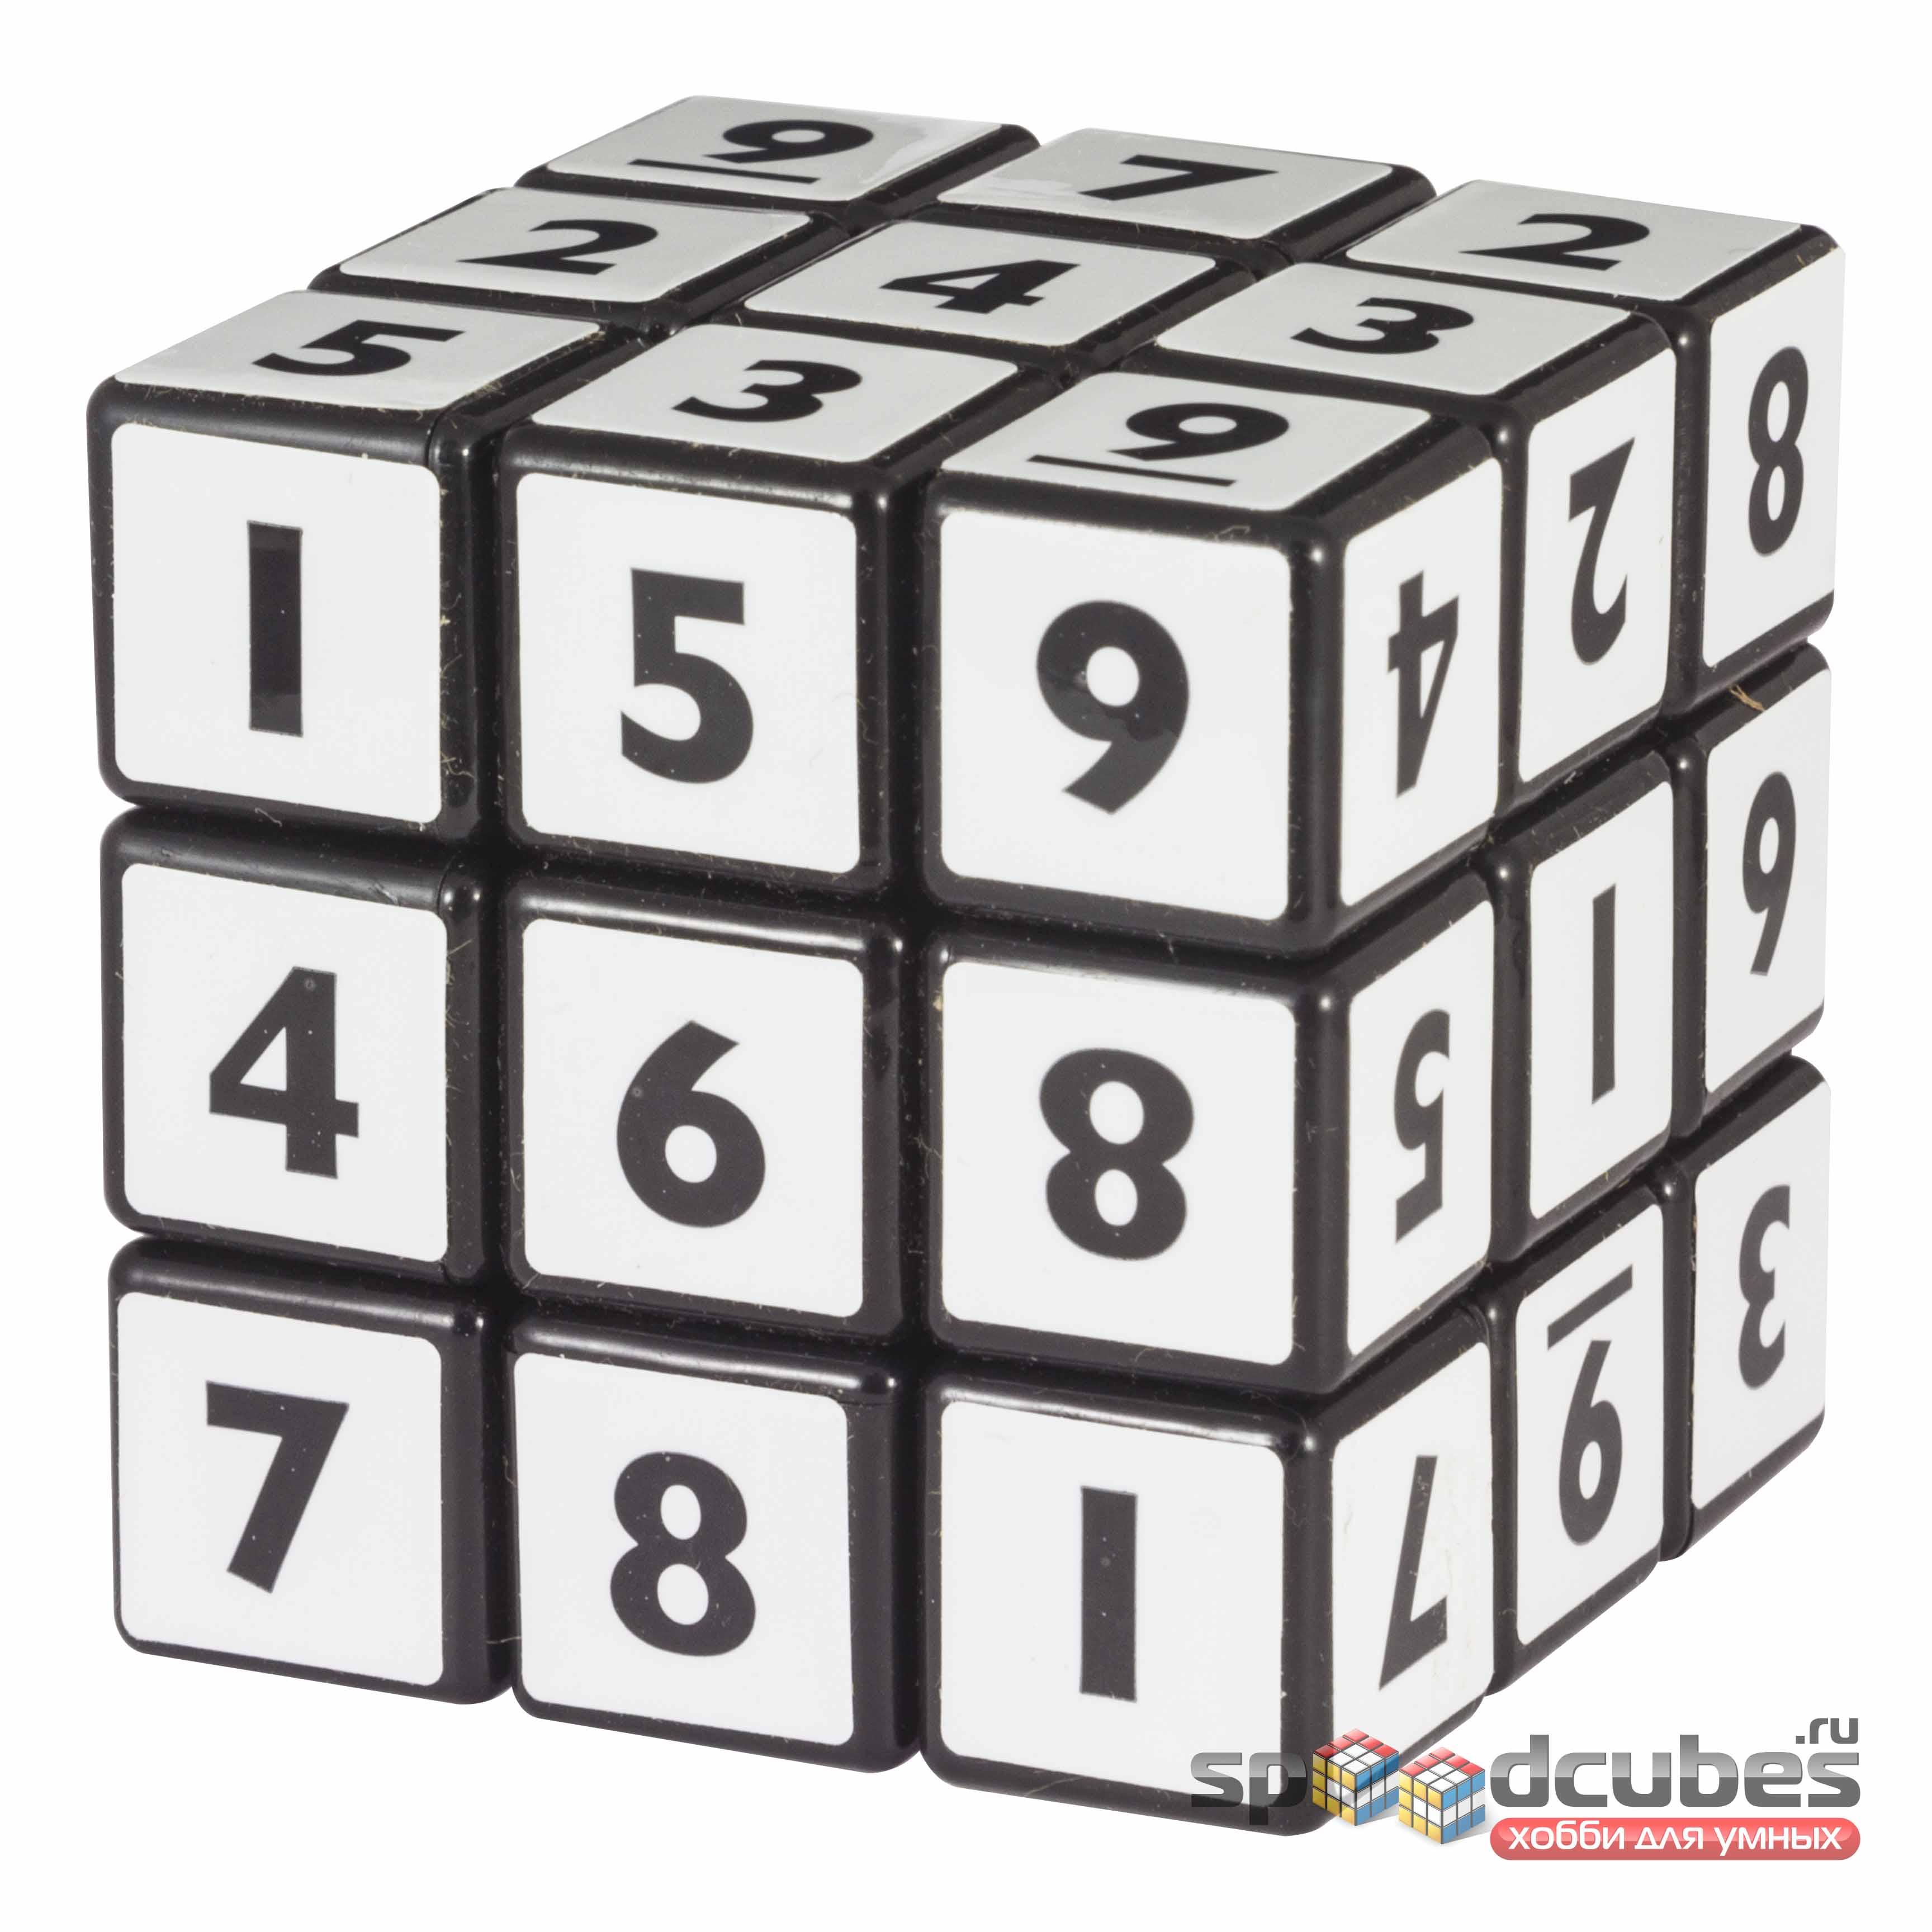 YJ Sudoku Cube 3x3x3 2